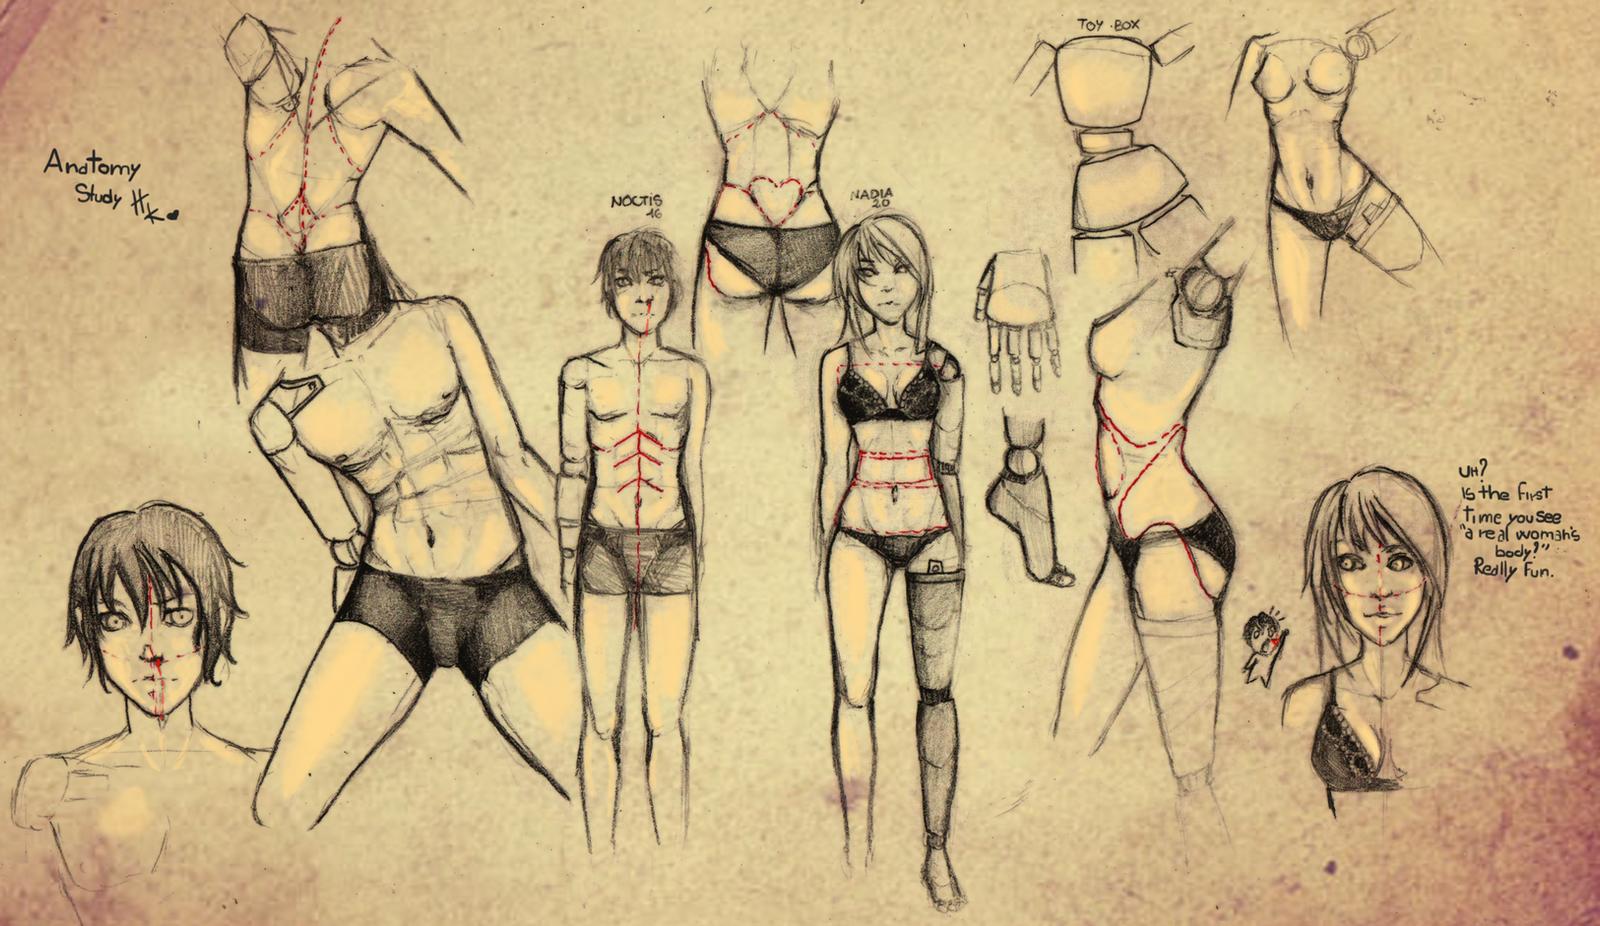 Anatomy study by HaitiKage on DeviantArt